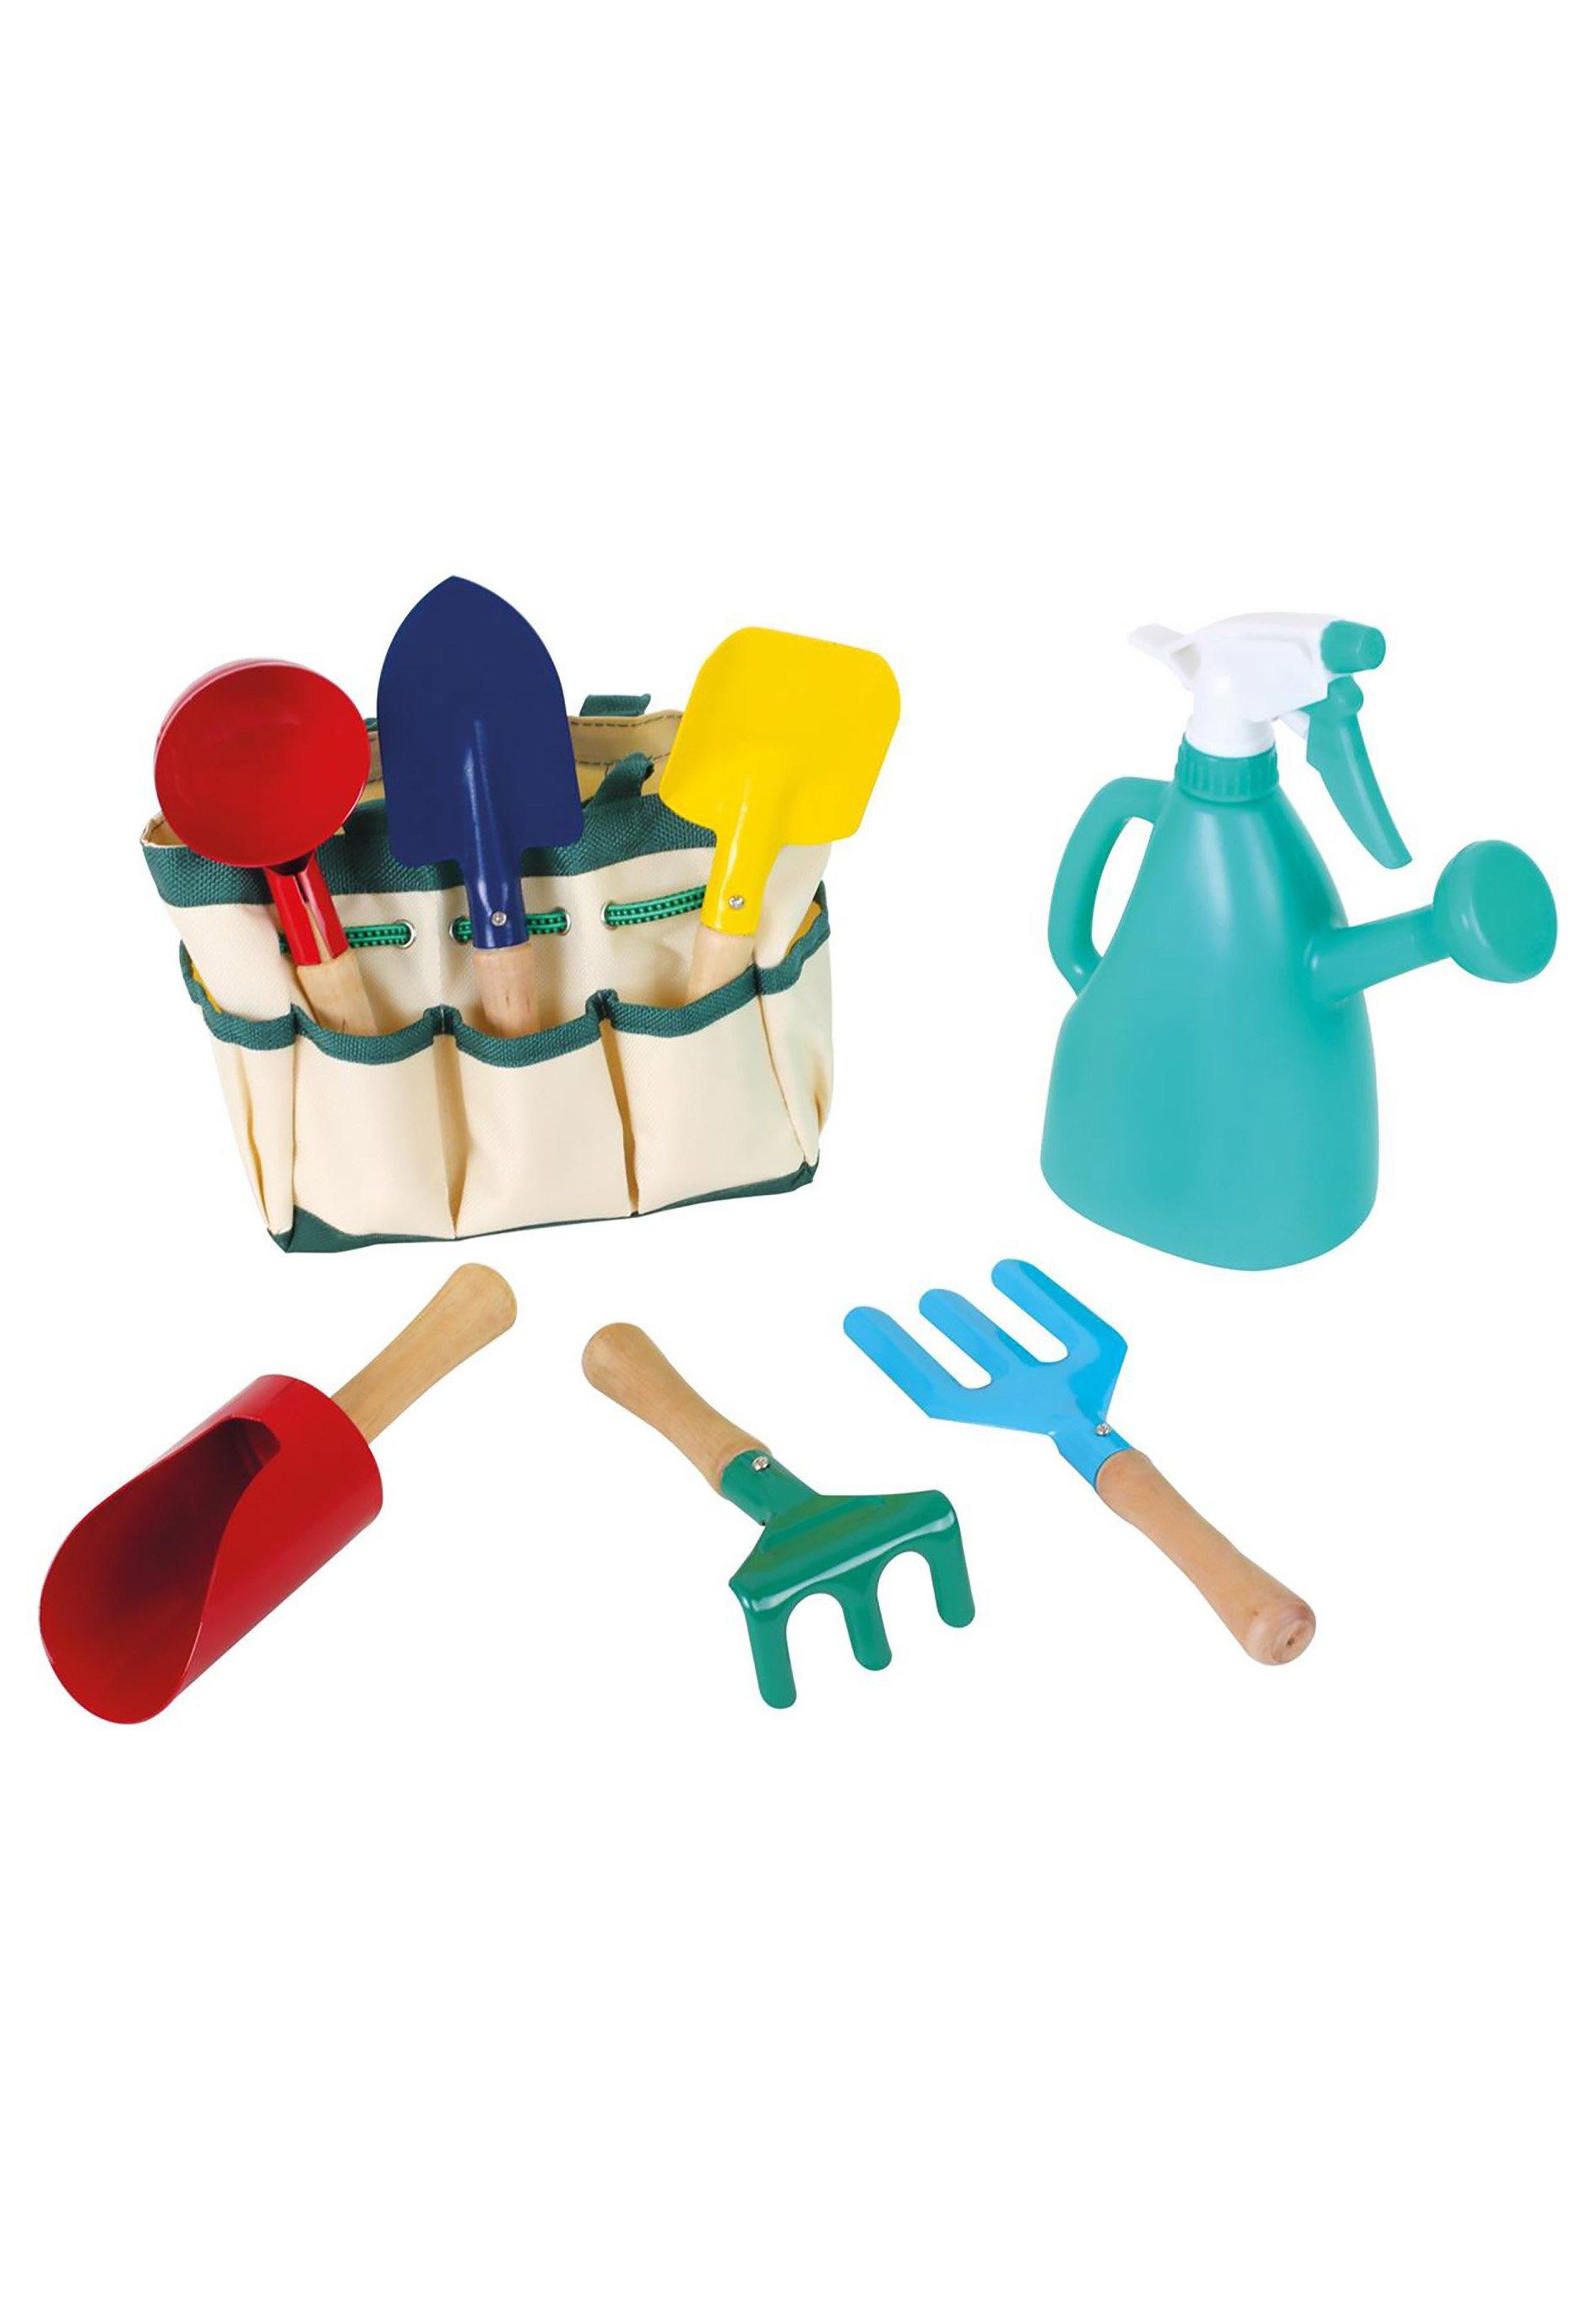 Kinder Sandspielzeug